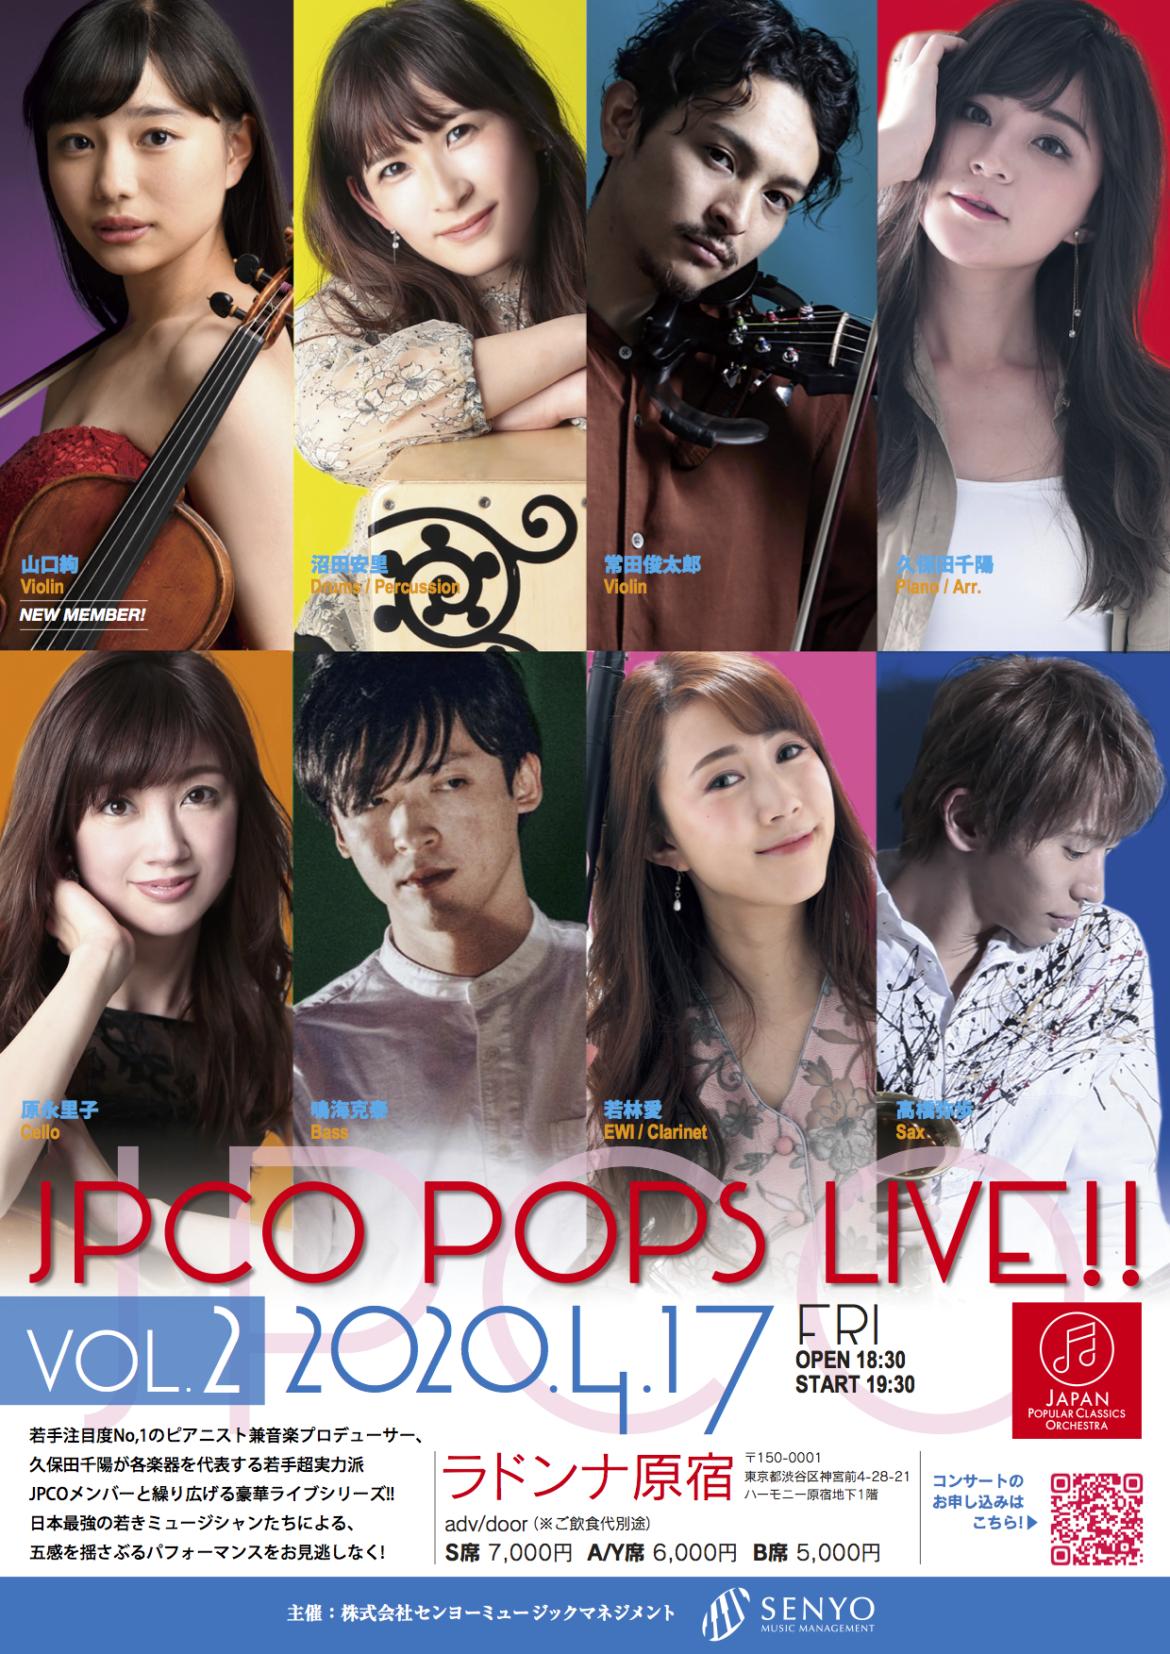 2020.7.10【公演再延期】JPCO POPS LIVE!! vol.2